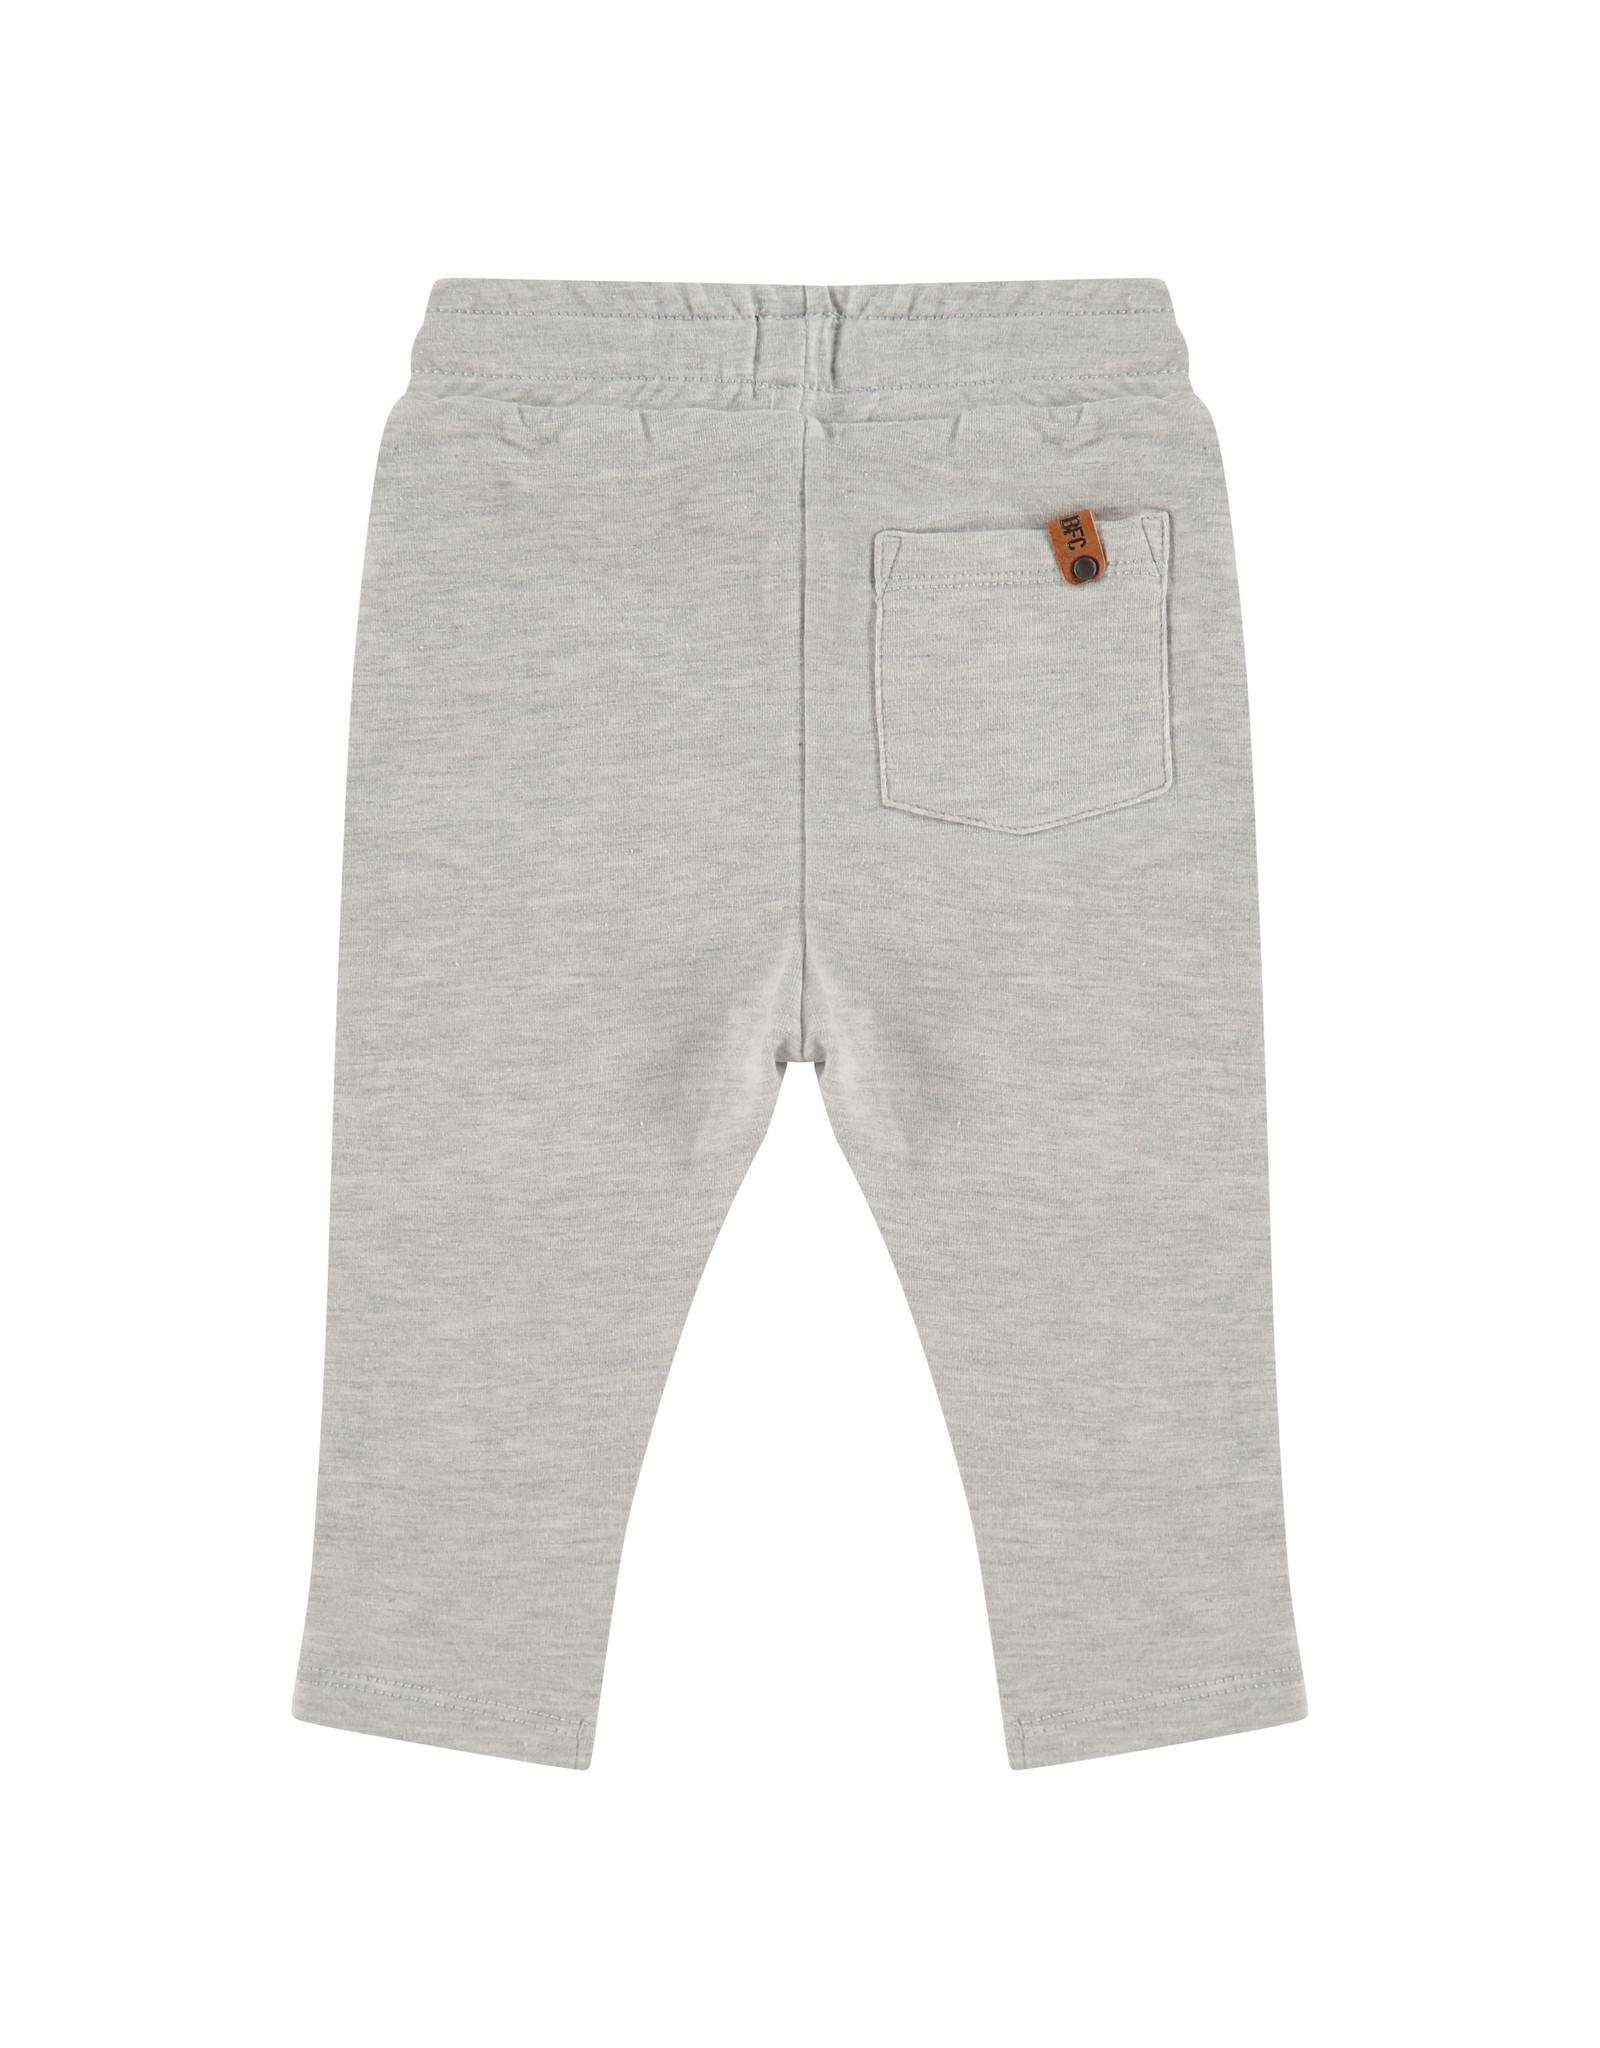 Babyface boys sweatpants, light grey melee, BBE21107209